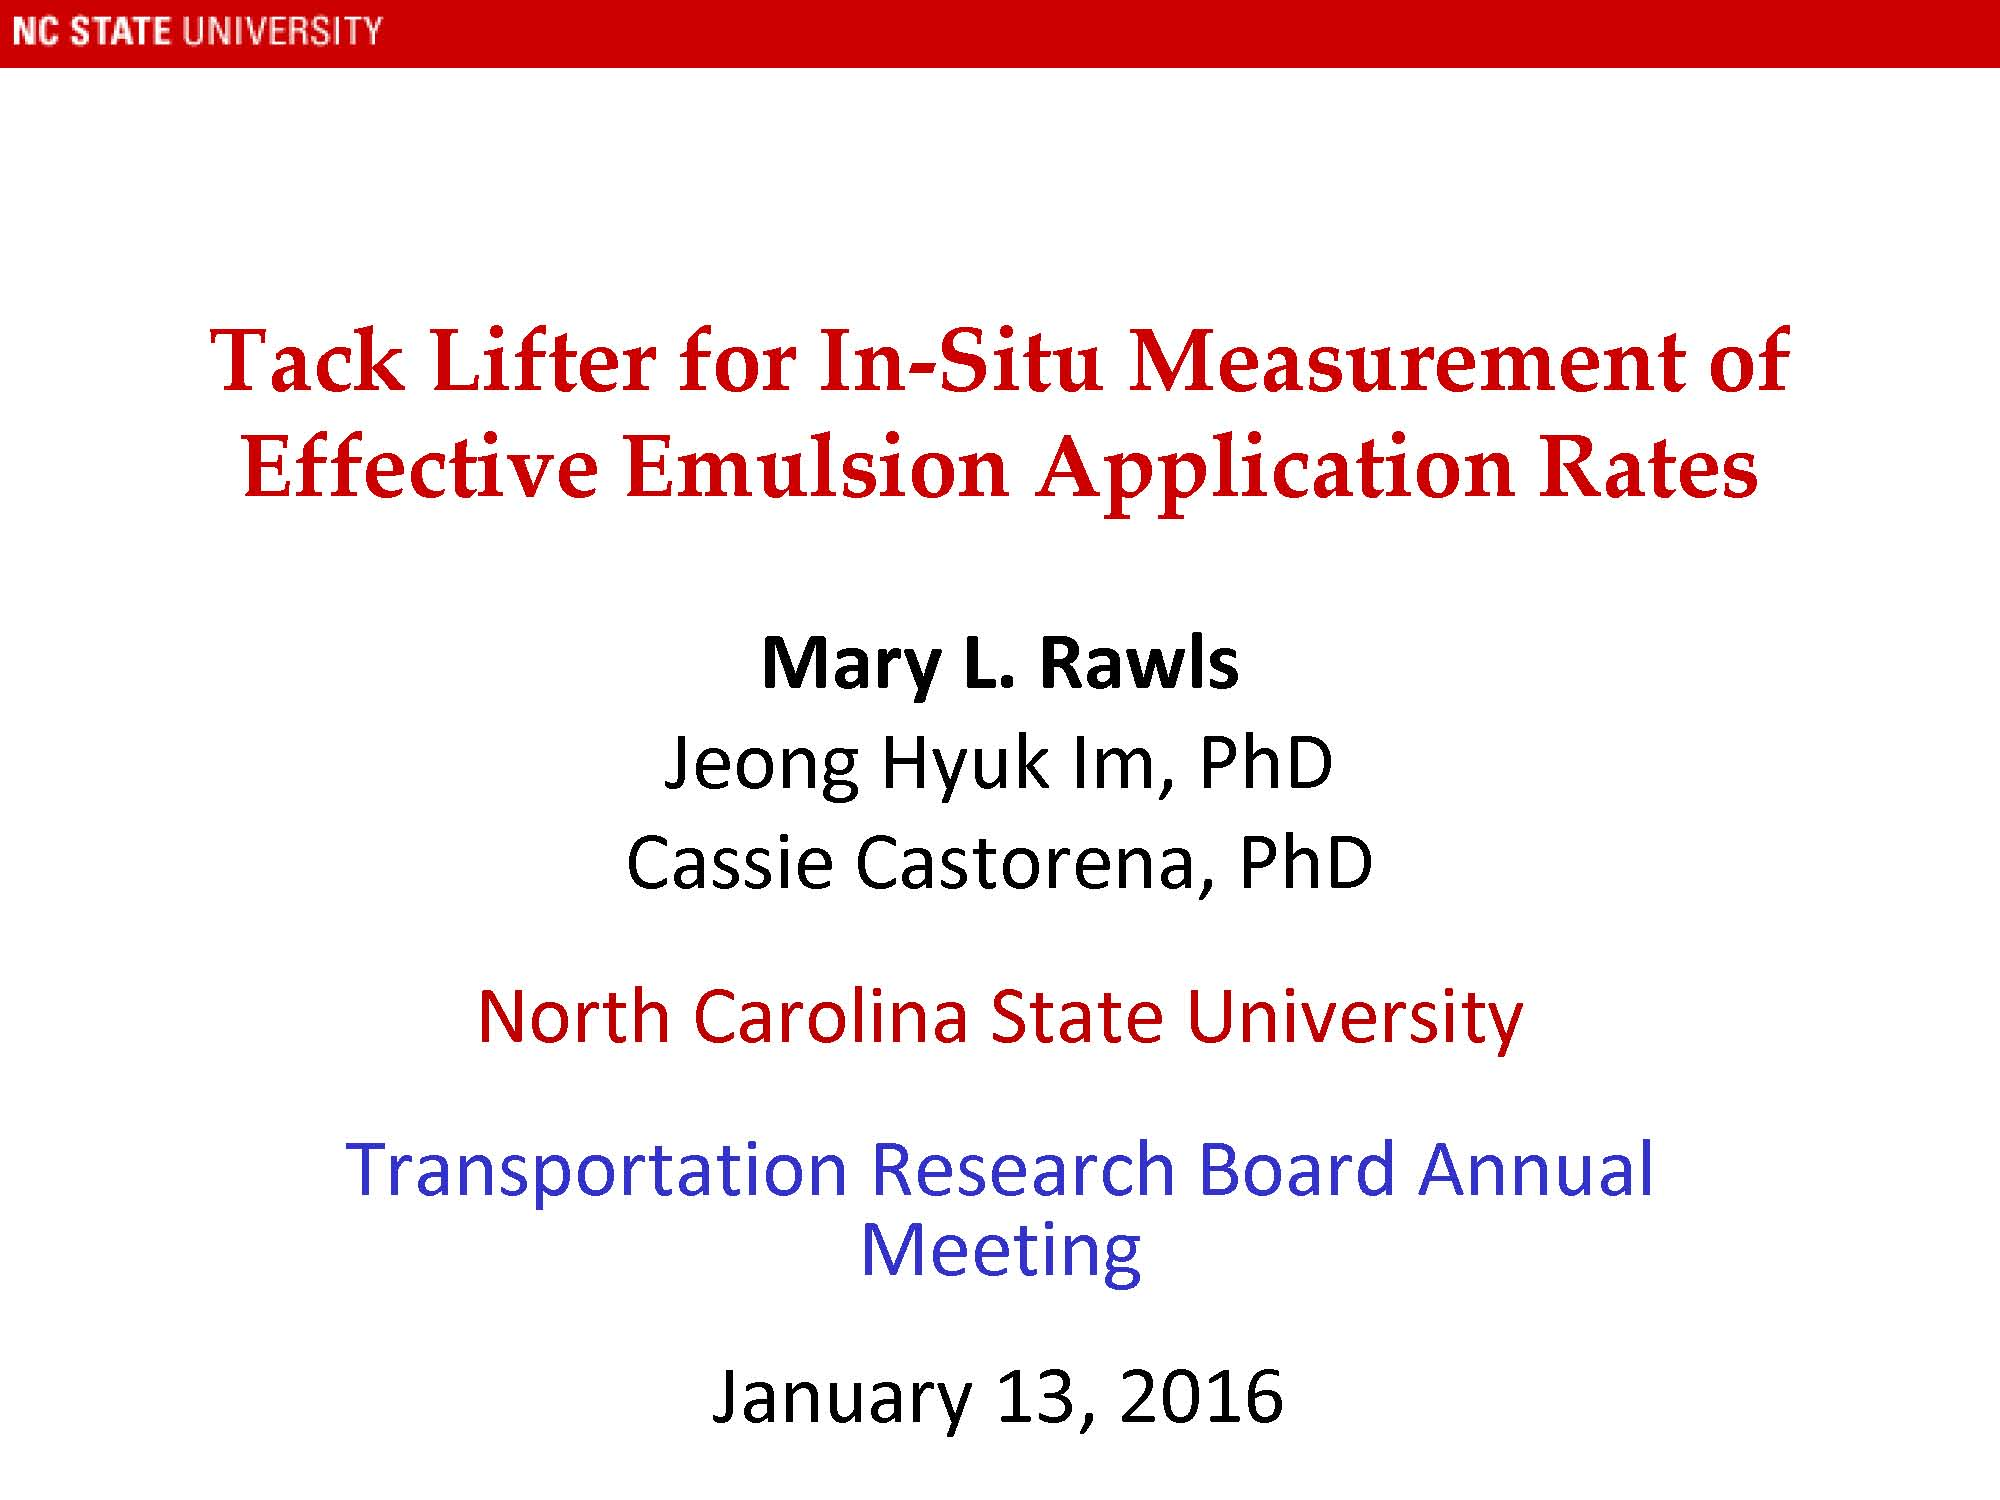 Tack Lifter for In Situ Measurement of Effective Emulsion ...